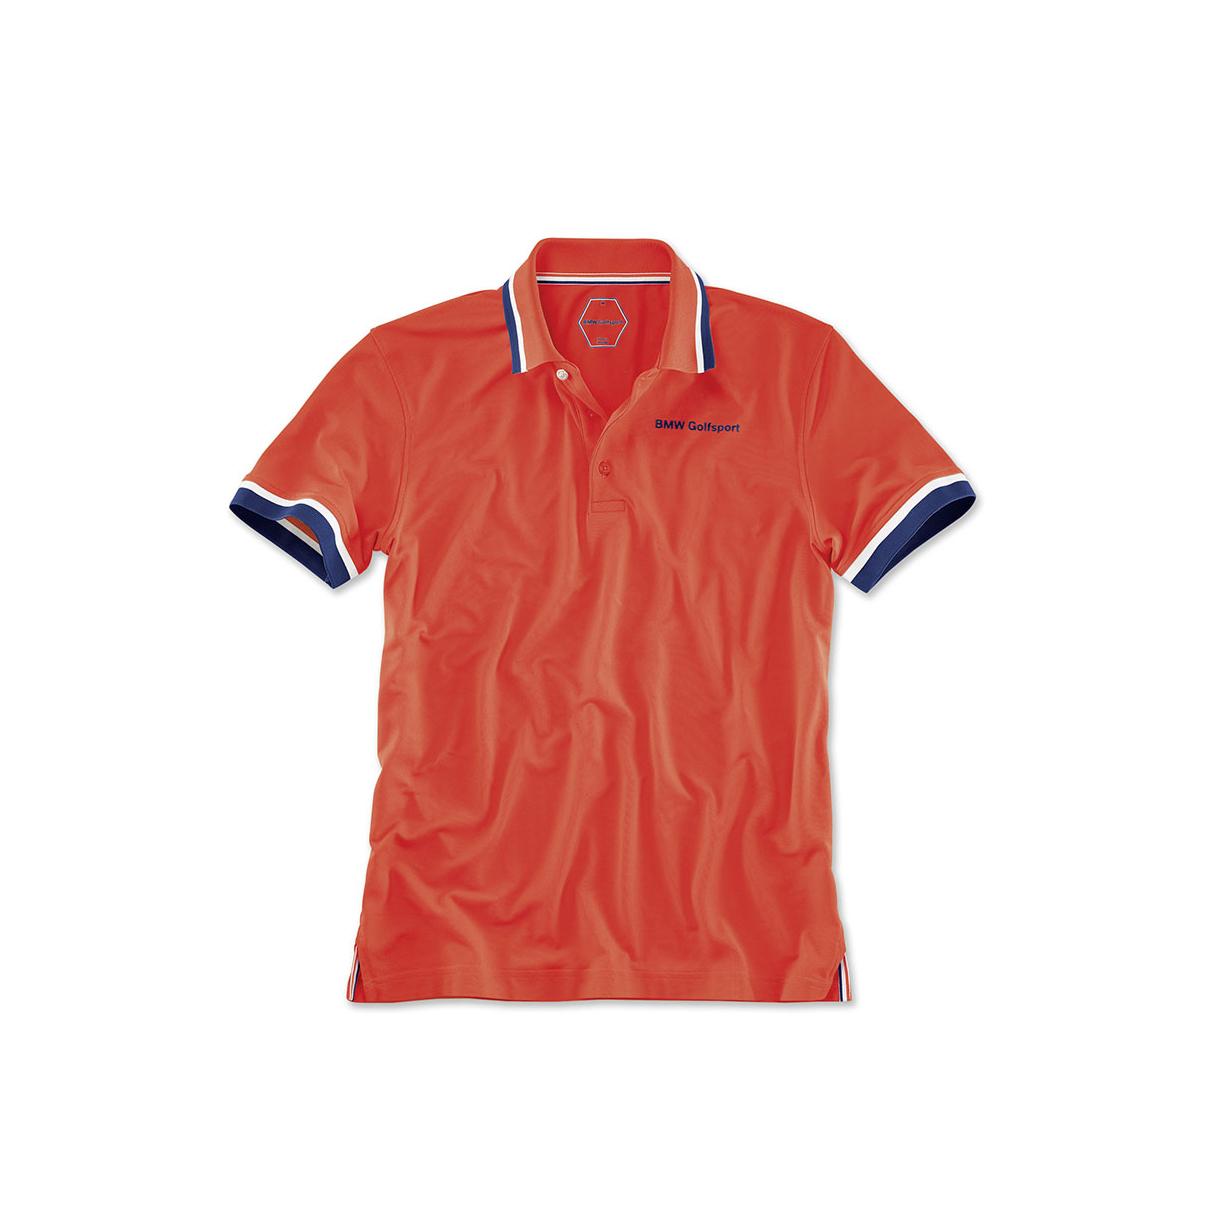 polo bmw golfsport homme dans bmw lifestyle golfsport boutique accessoires et lifestyle. Black Bedroom Furniture Sets. Home Design Ideas